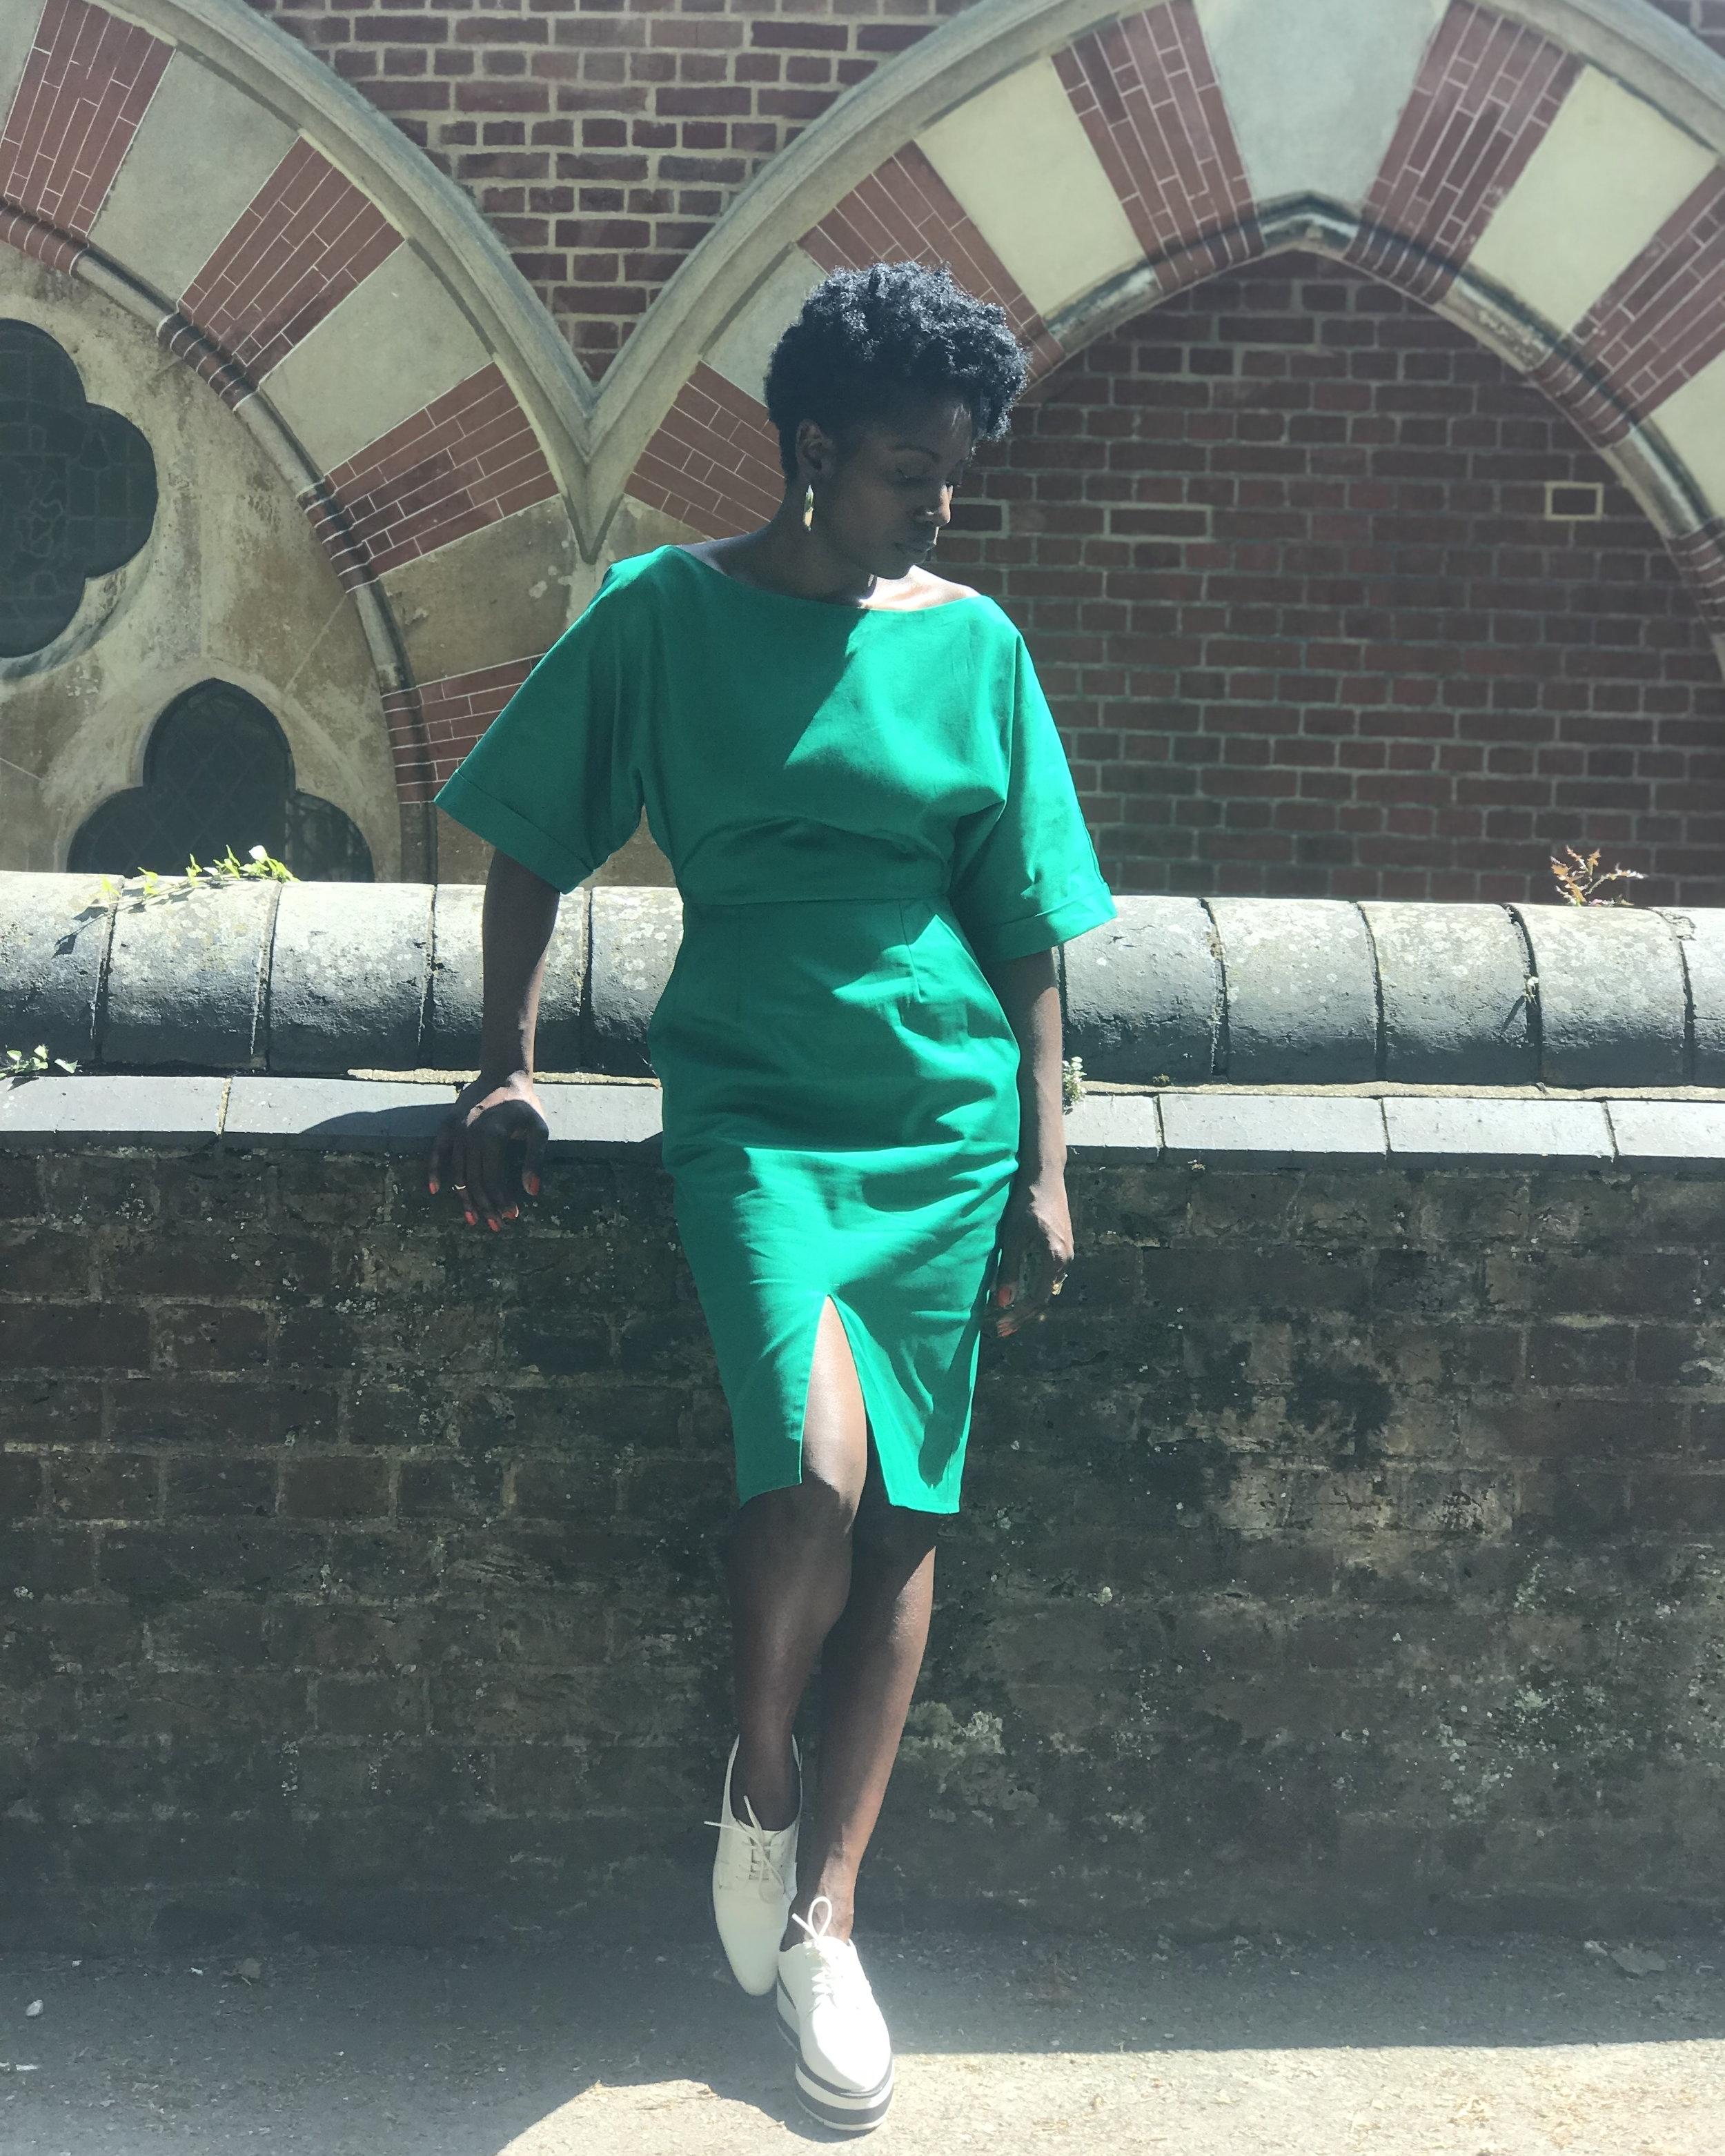 black women in wellness, wellness, slow living, live three sixty, self care, Black girl in Ohm, black vegans, mind body spirit, self love, strong girls club